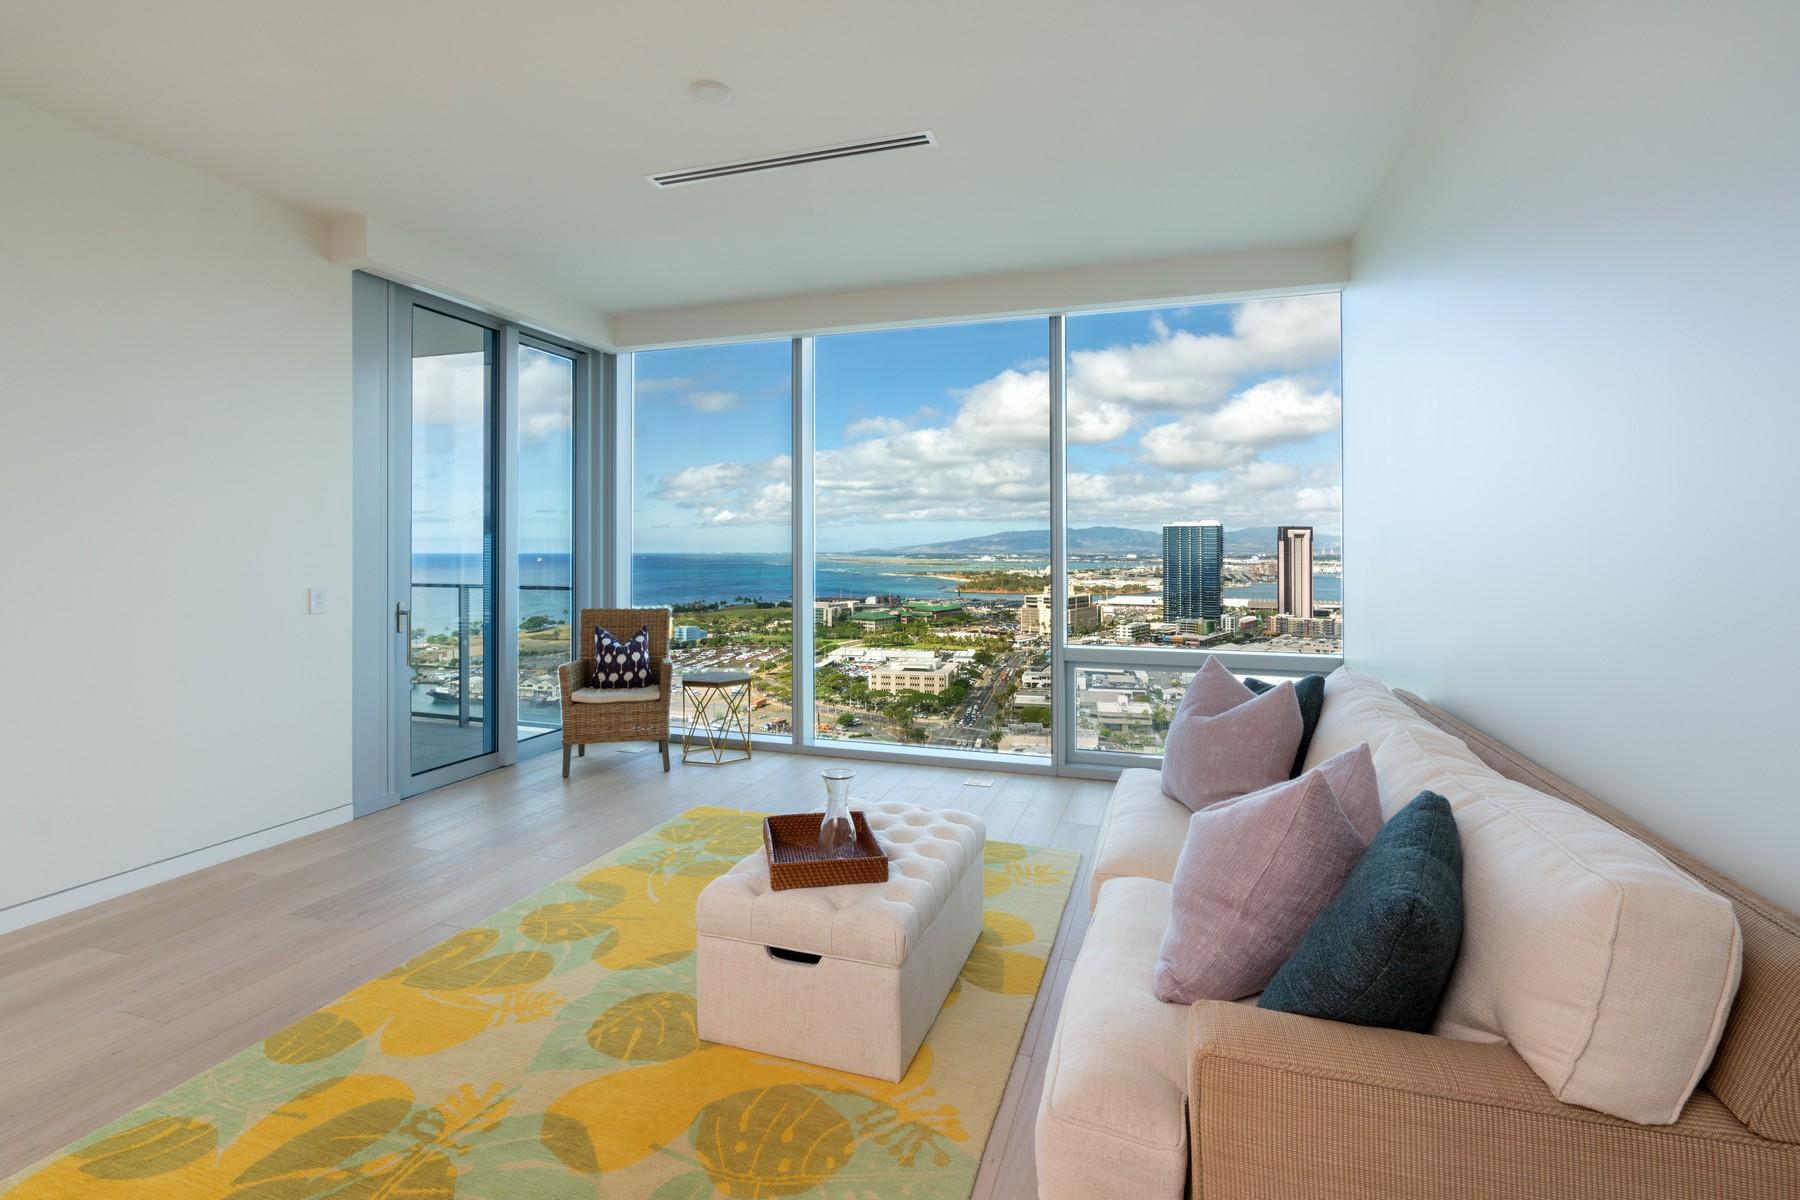 Condominium for Sale at Panoramic Ocean View Waiea Condo 1118 Ala Moana Blvd #2903 Kakaako, Honolulu, Hawaii, 96814 United States